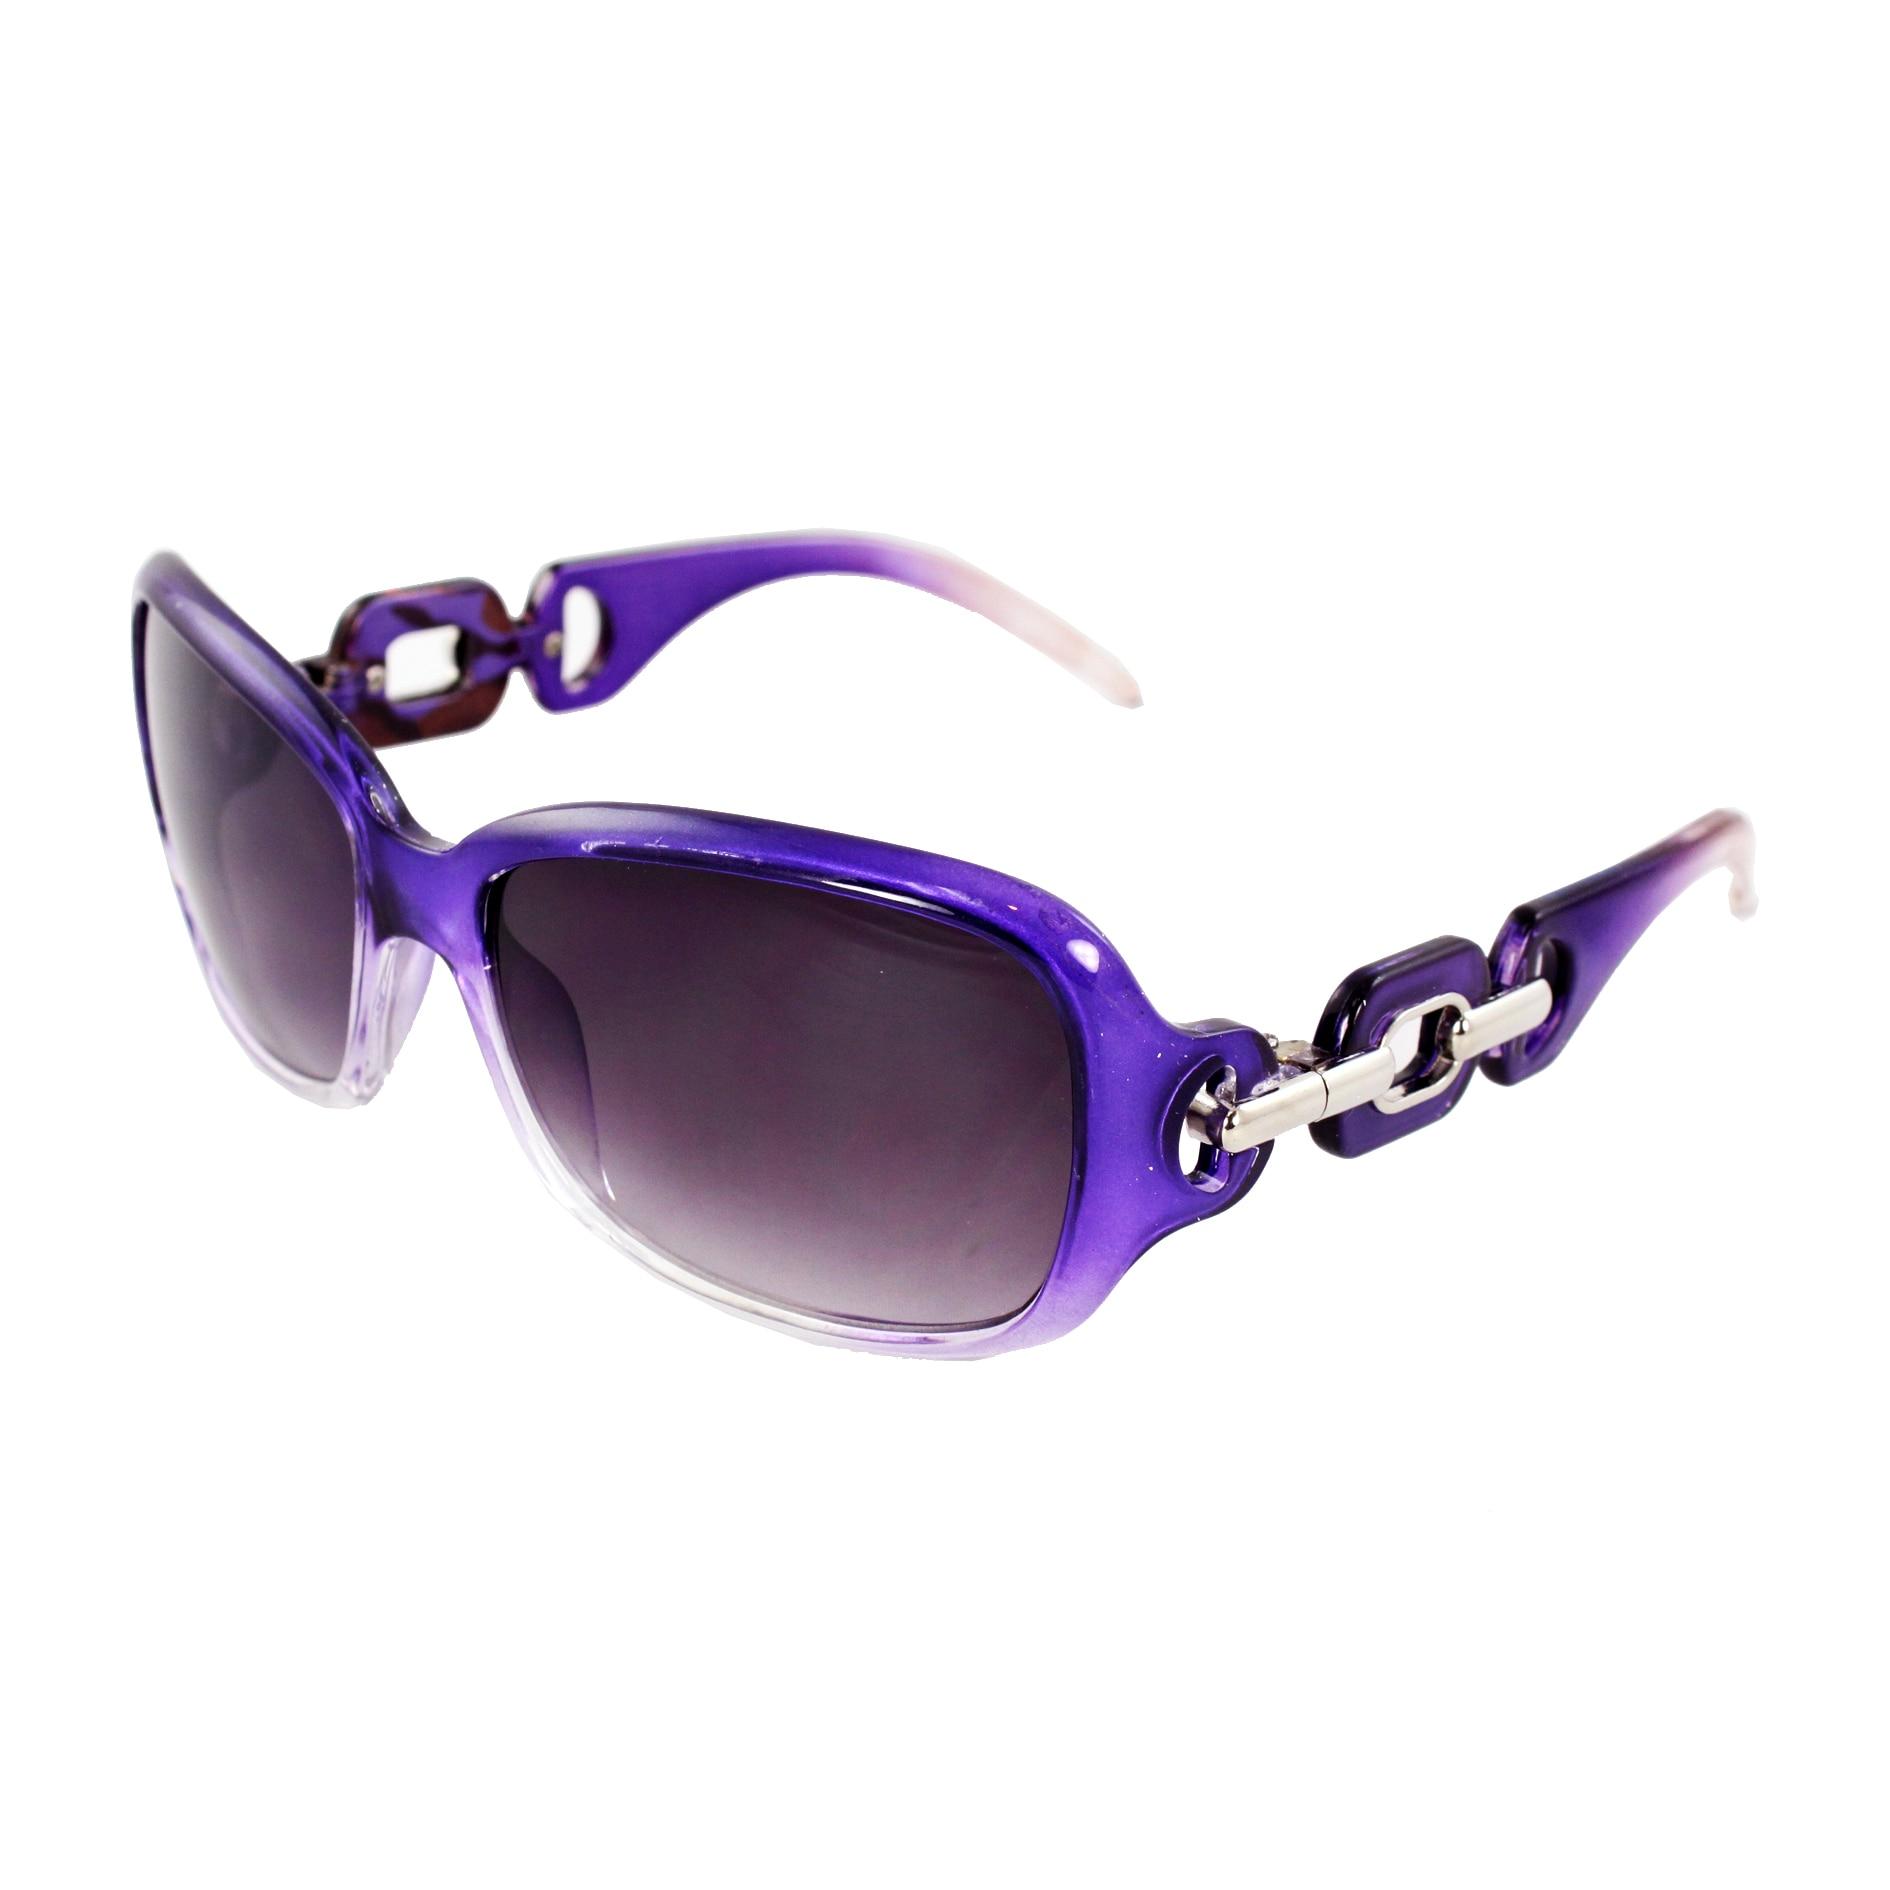 Square Fashion Sunglasses Purple Clear 2tone Frame Purple Black Lenses for Women